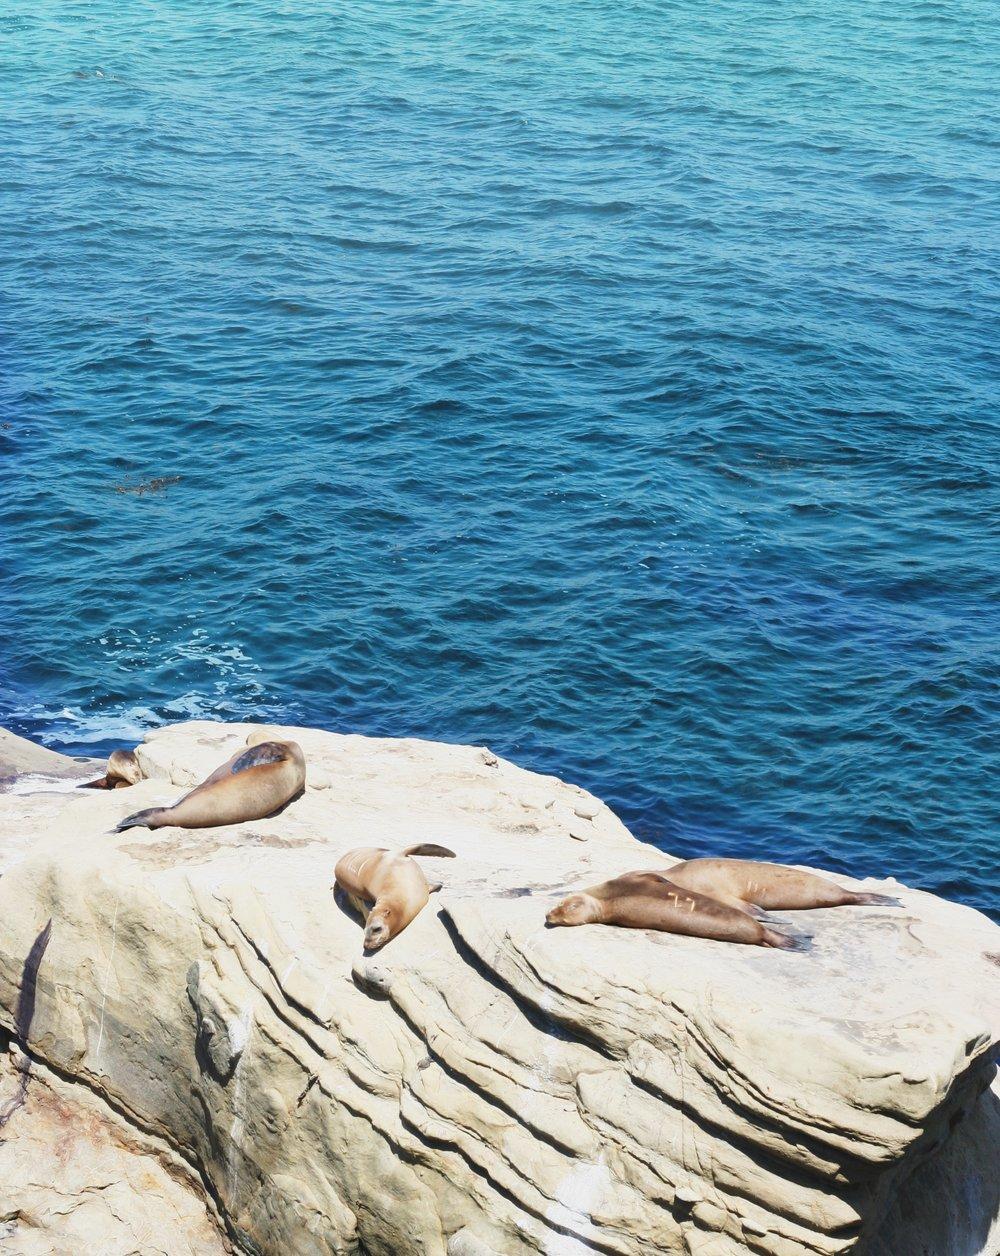 So many Sea Lions at La Jolla Cove.